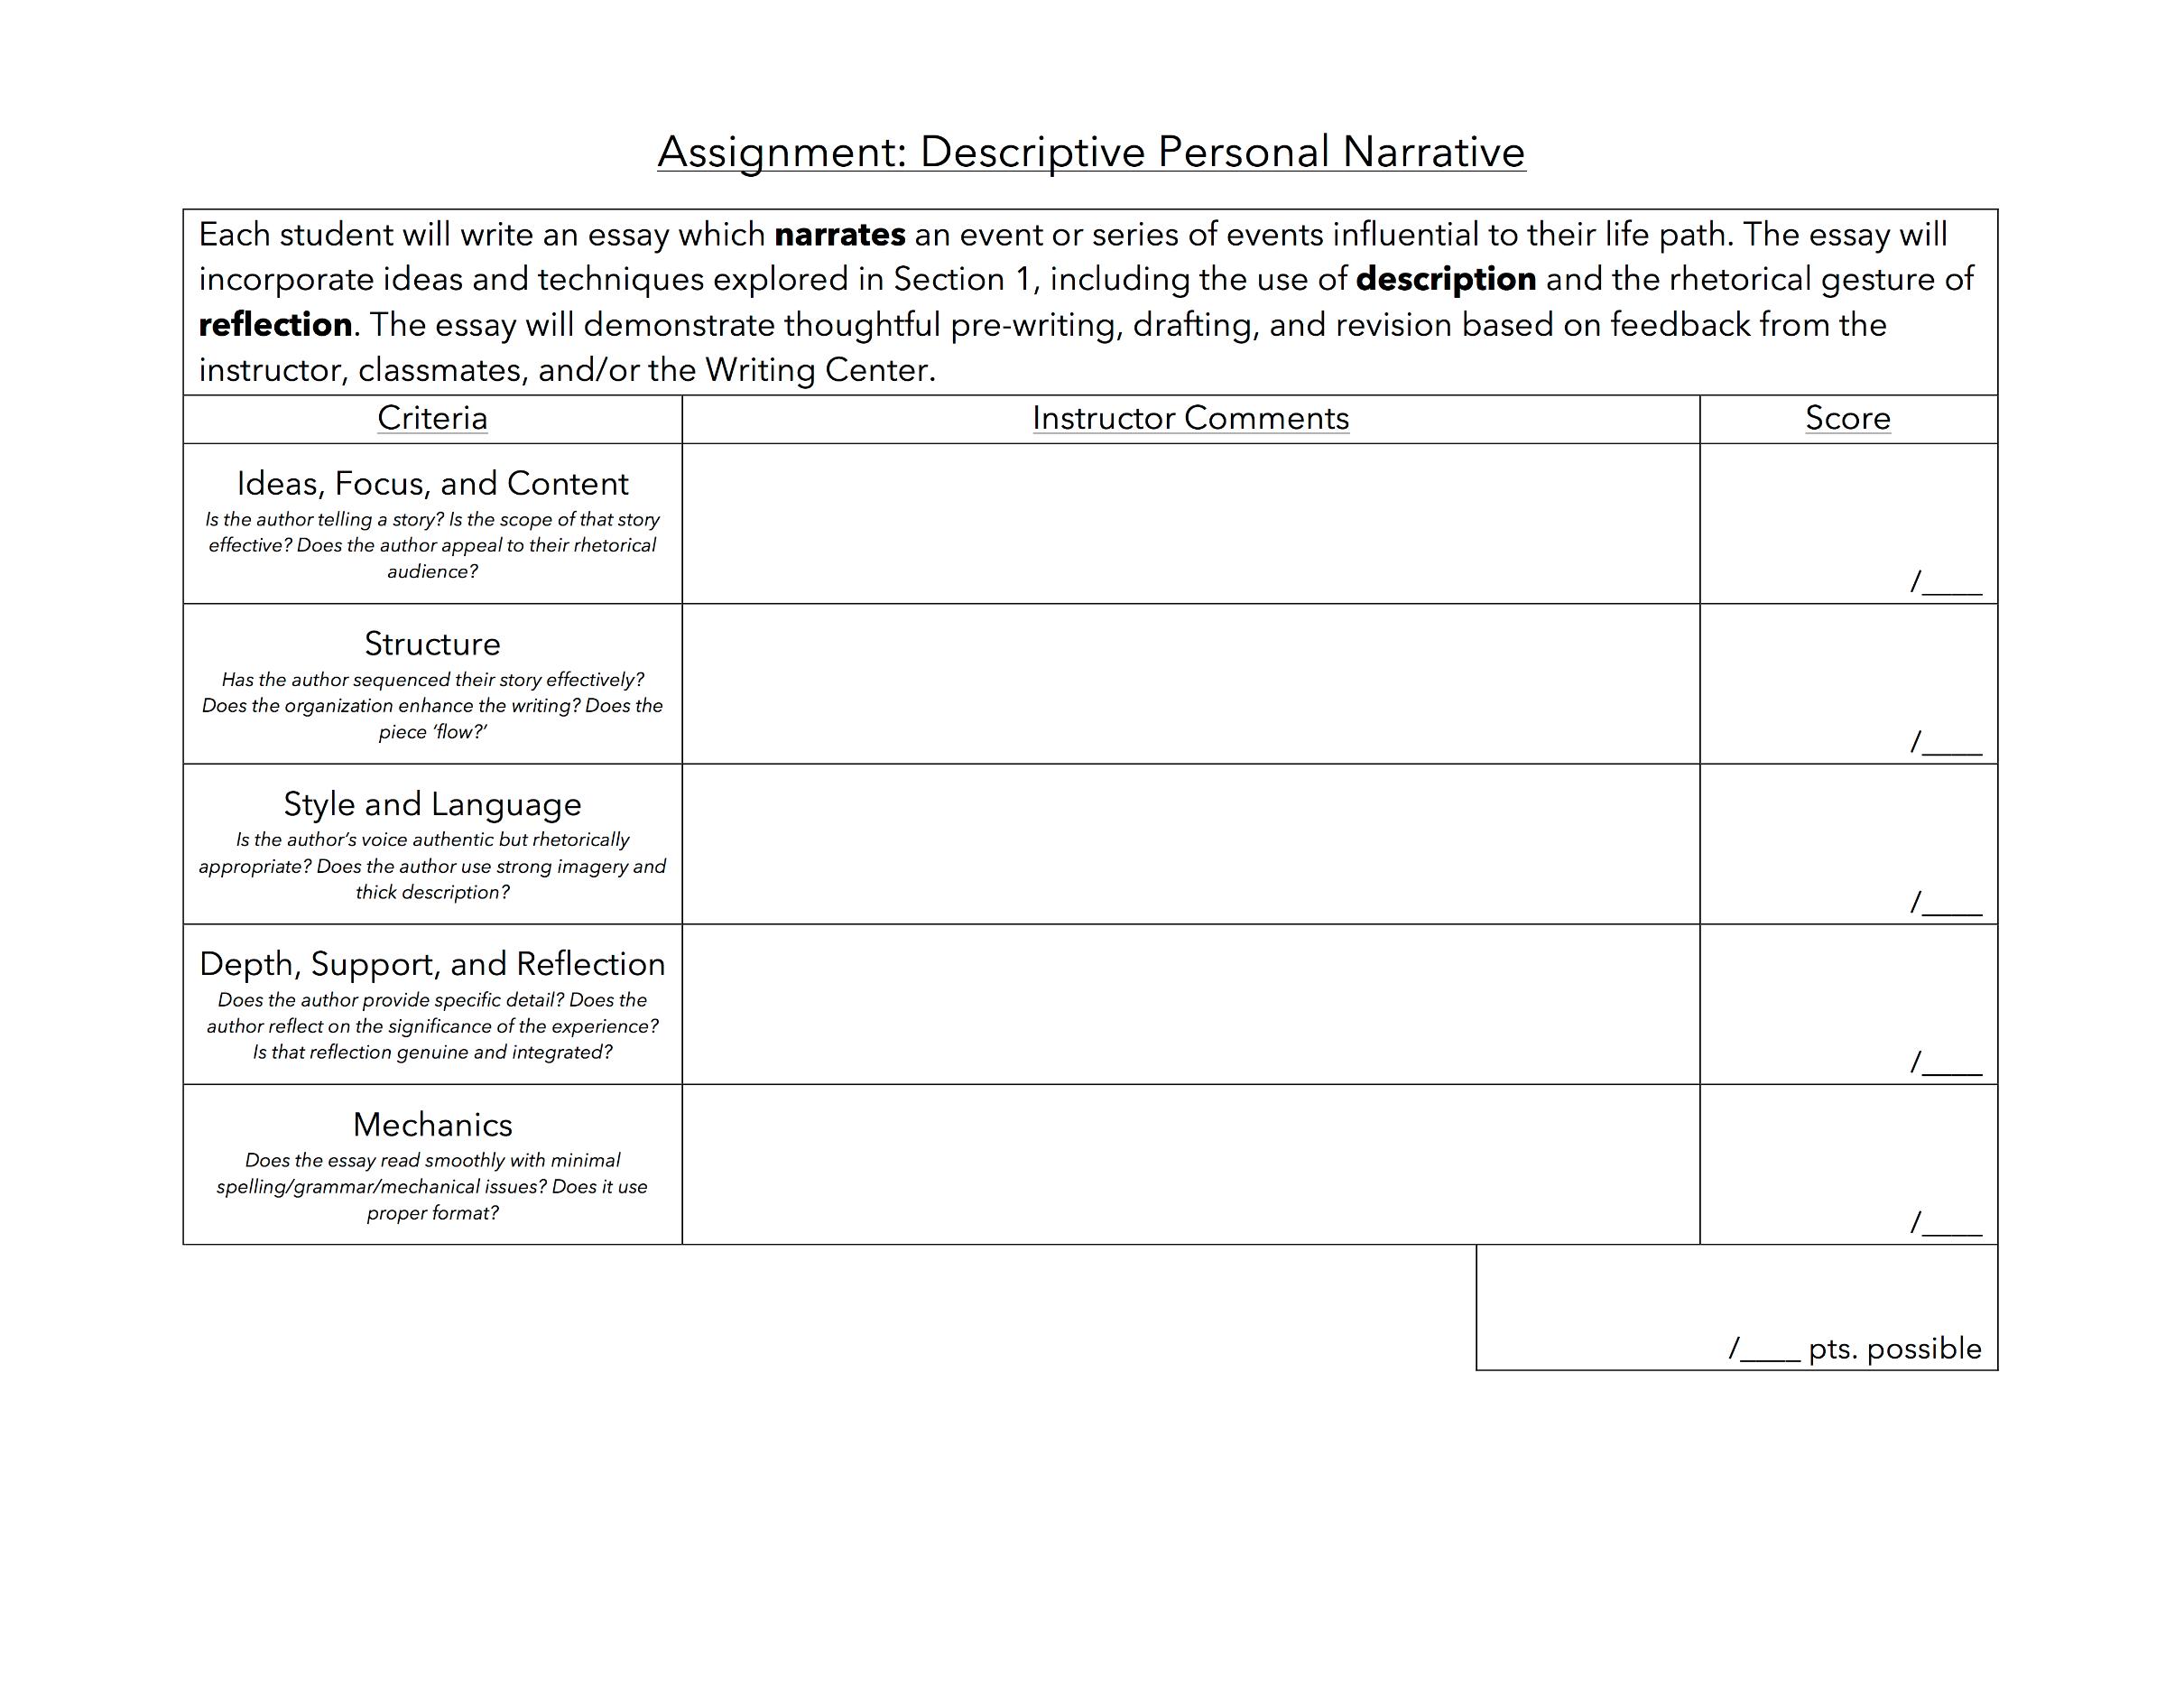 Rubric for Descriptive Personal Narrative. For accessible version, contact pdxscholar@pdx.edu.